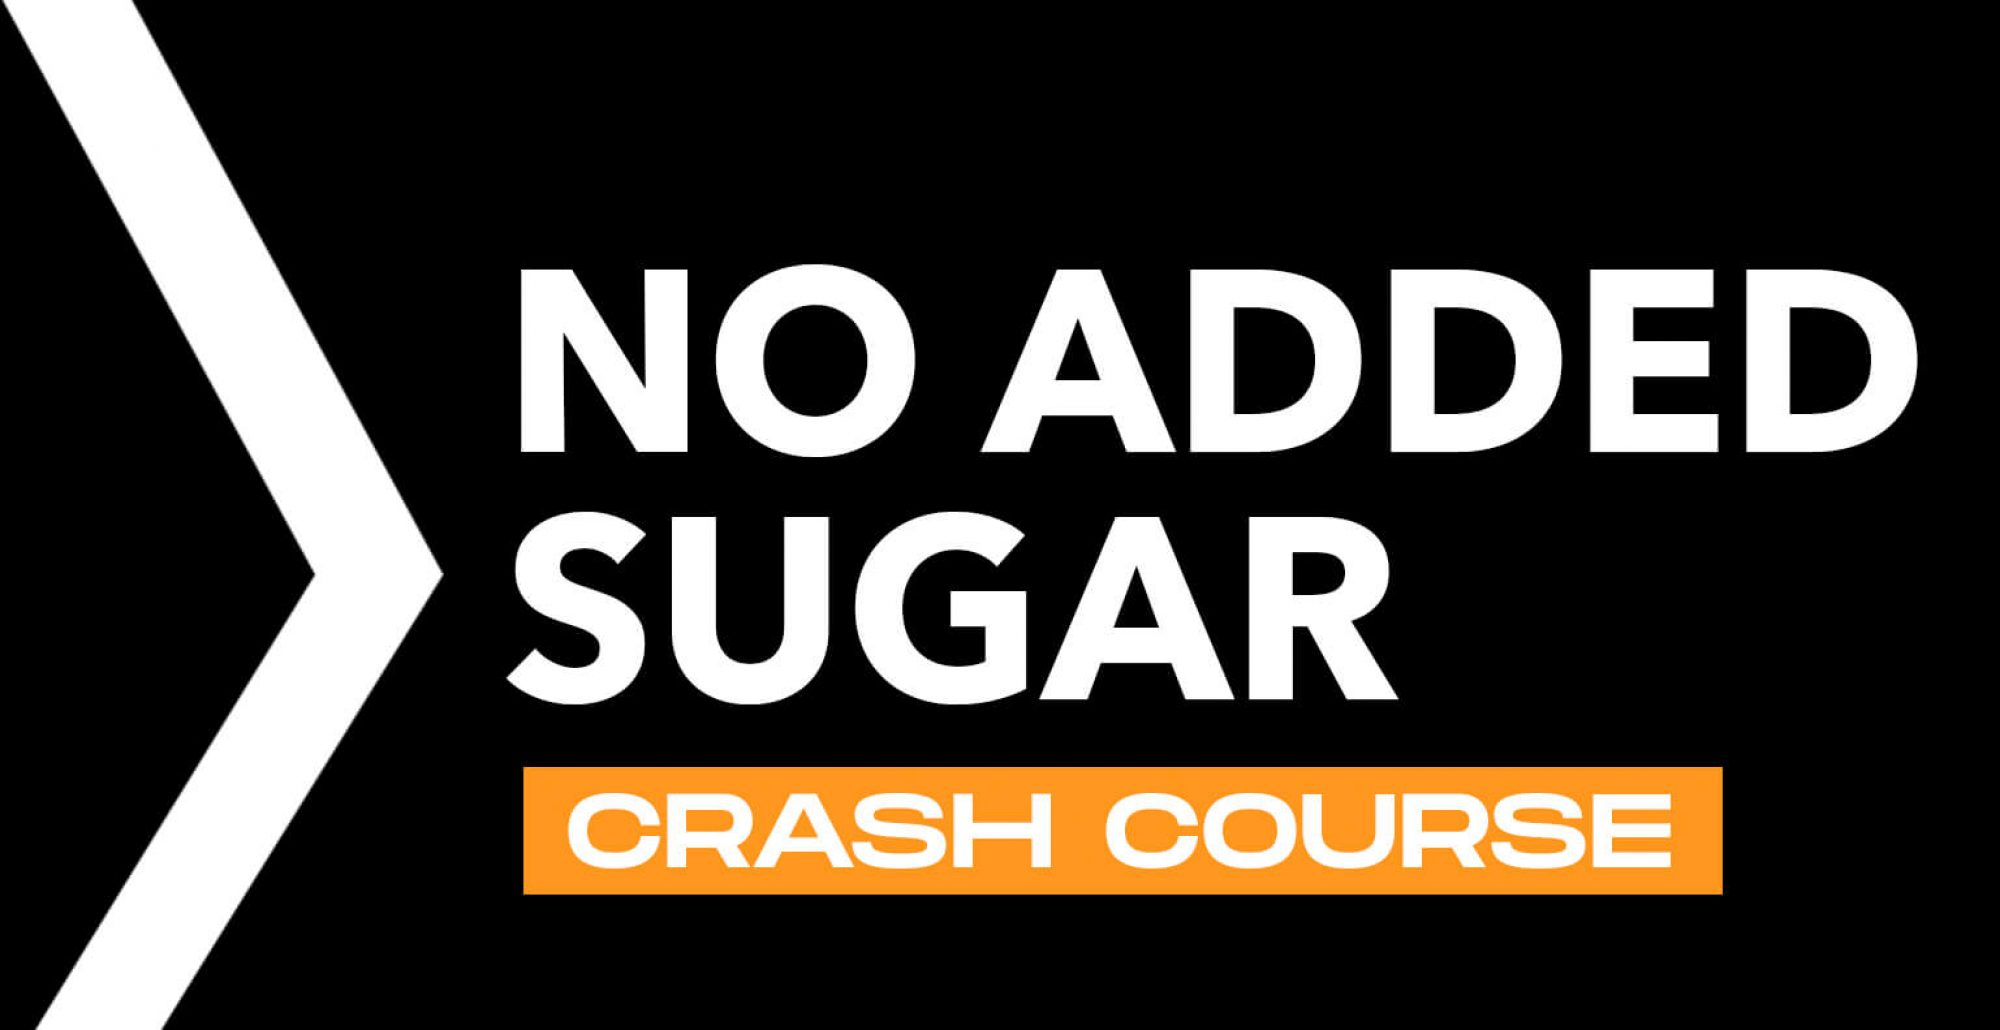 No-Added-Sugar-Halo-University.jpg